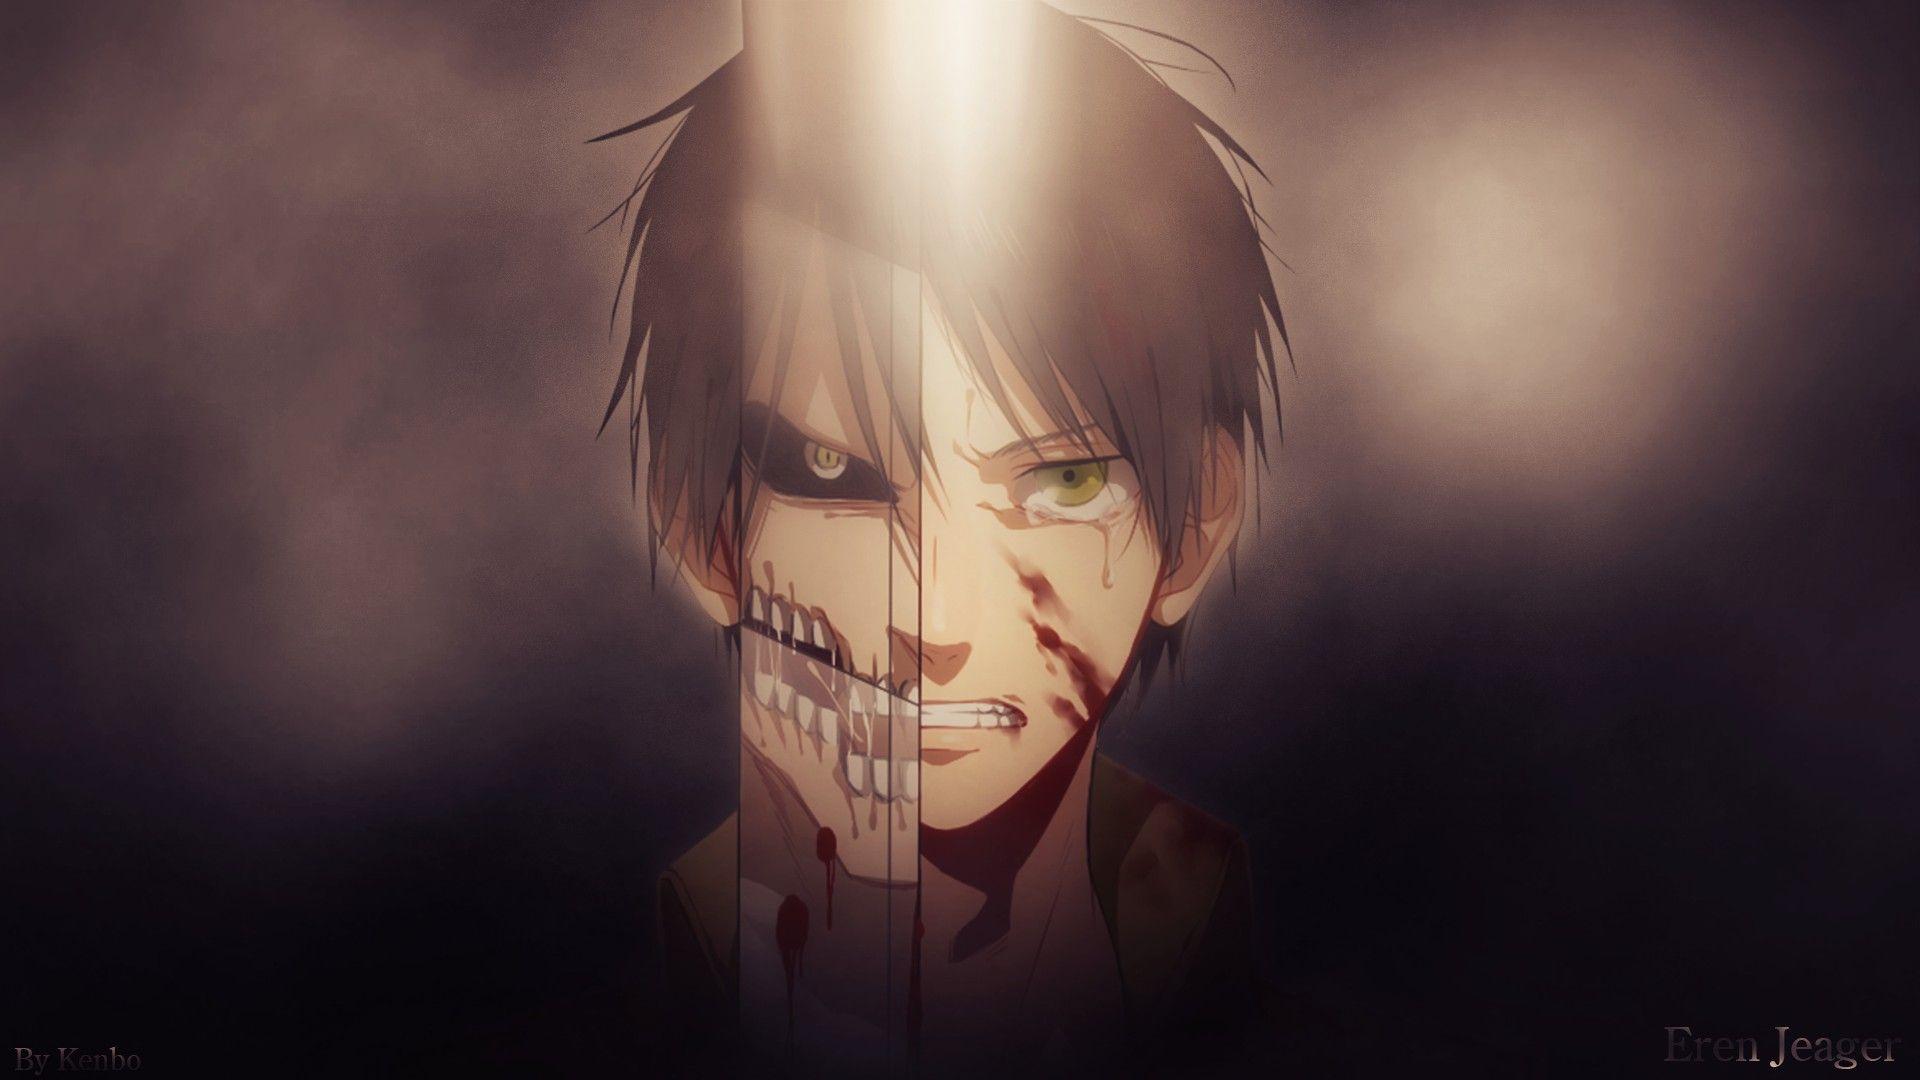 Pin By Rohaina Kantong On Ei Attack On Titan Android Wallpaper Anime Anime Wallpaper